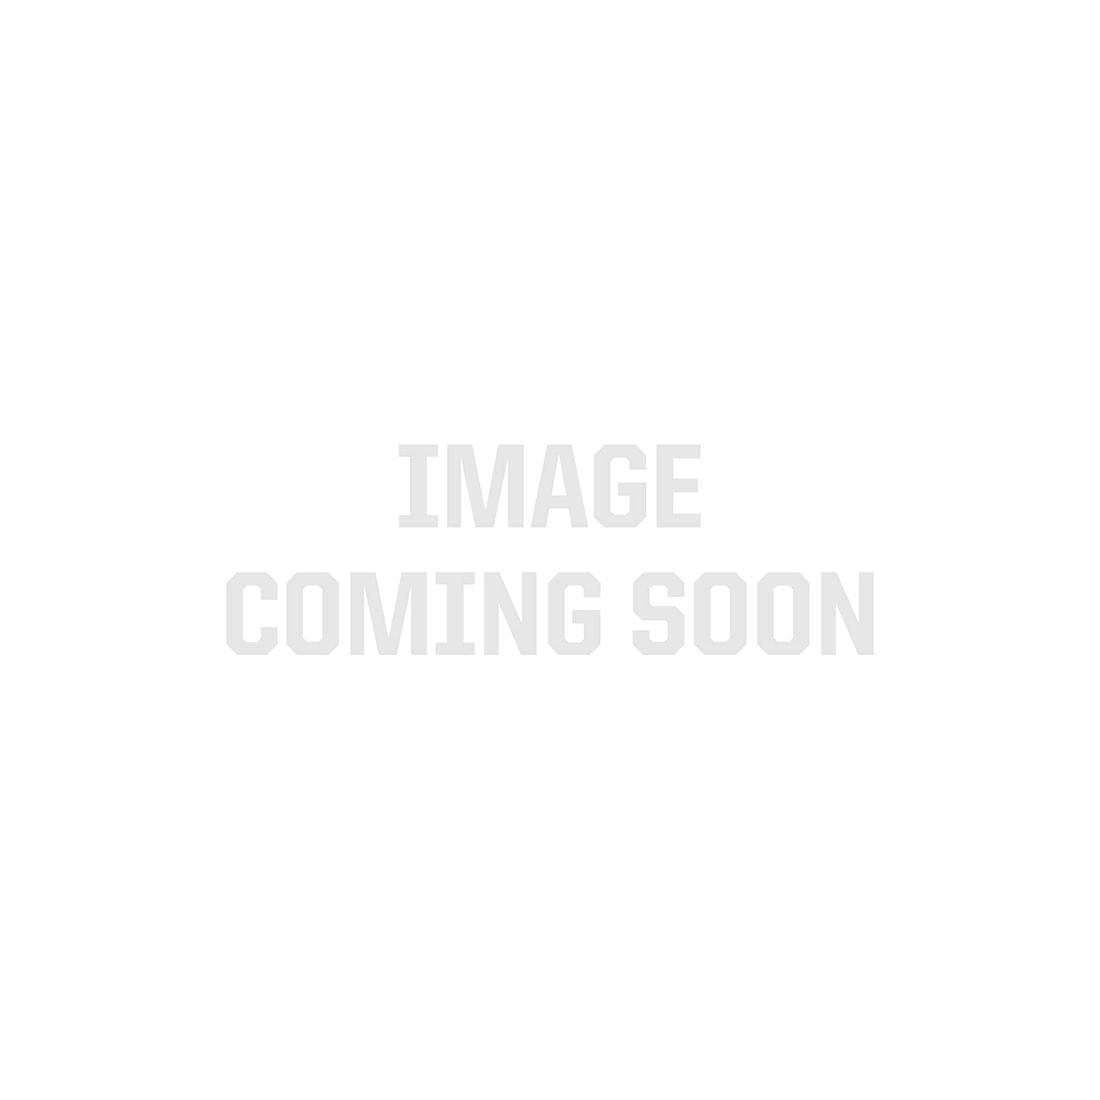 UltraSlim RGB 2835 LED Strip Light - 84/m - Sample Kit